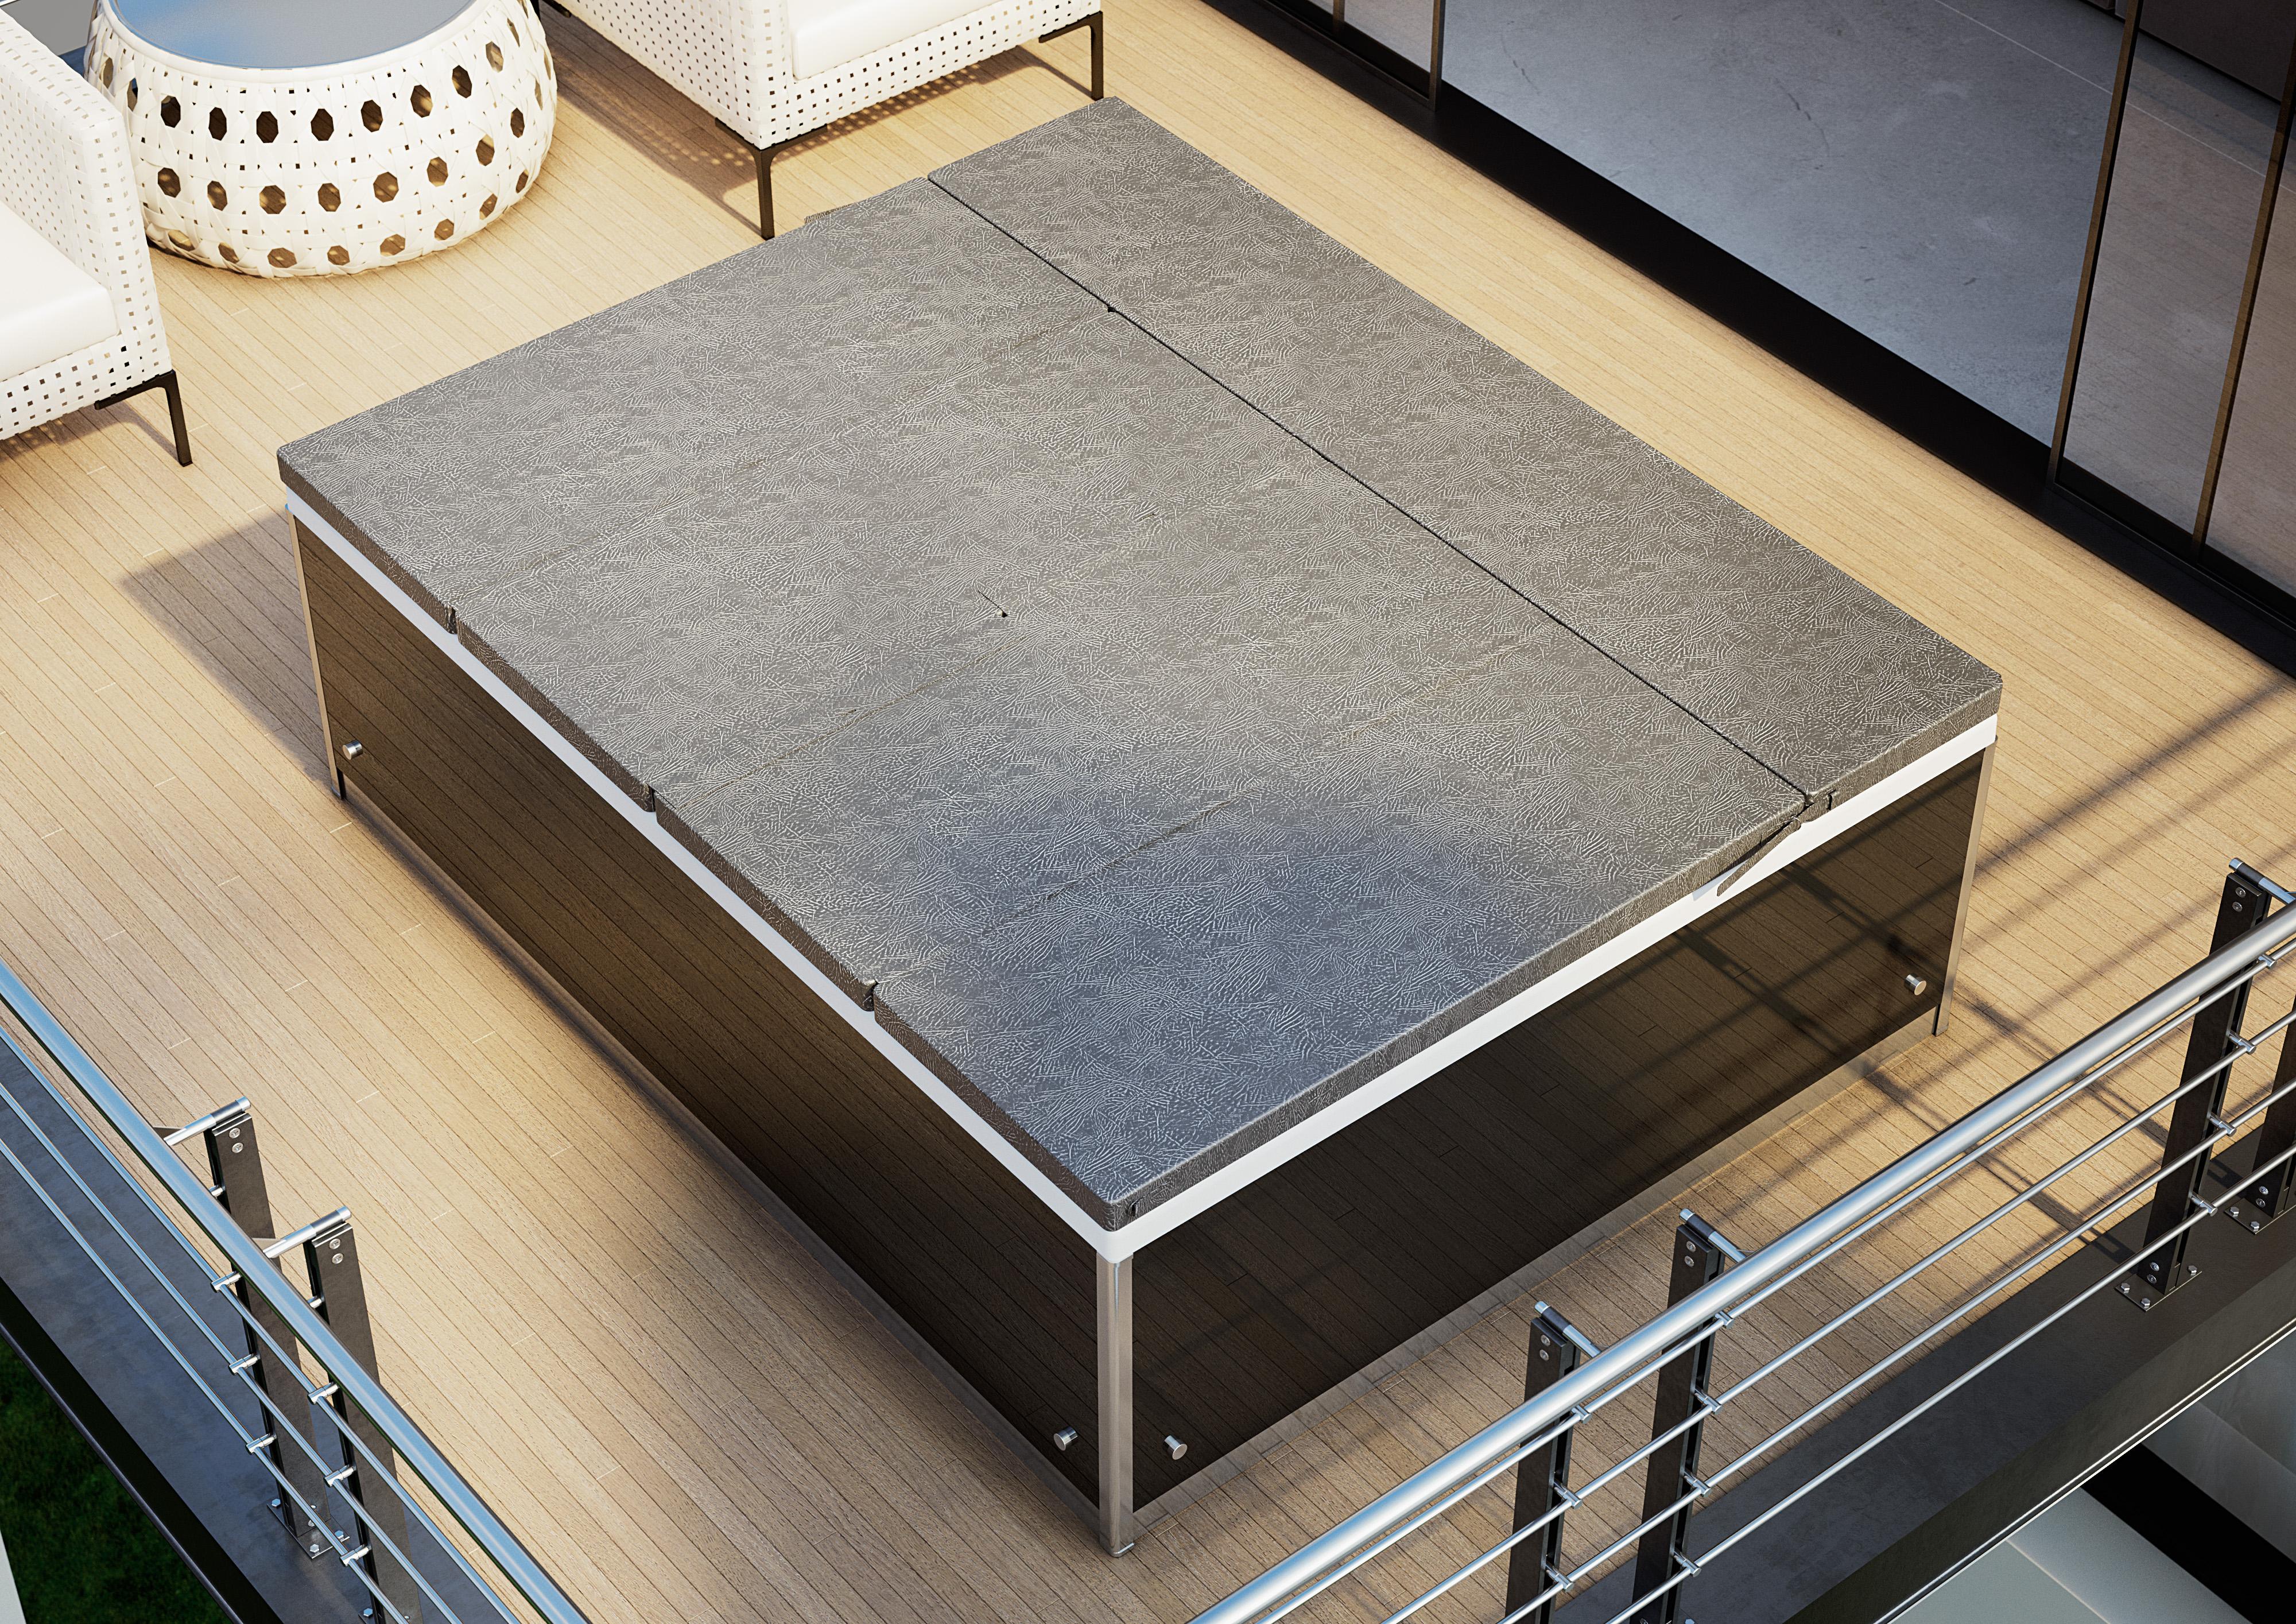 Magic spa 200x160 cm 2 places kinedo kinedo baignoire balneo et spa spa - Couverture thermique spa ...